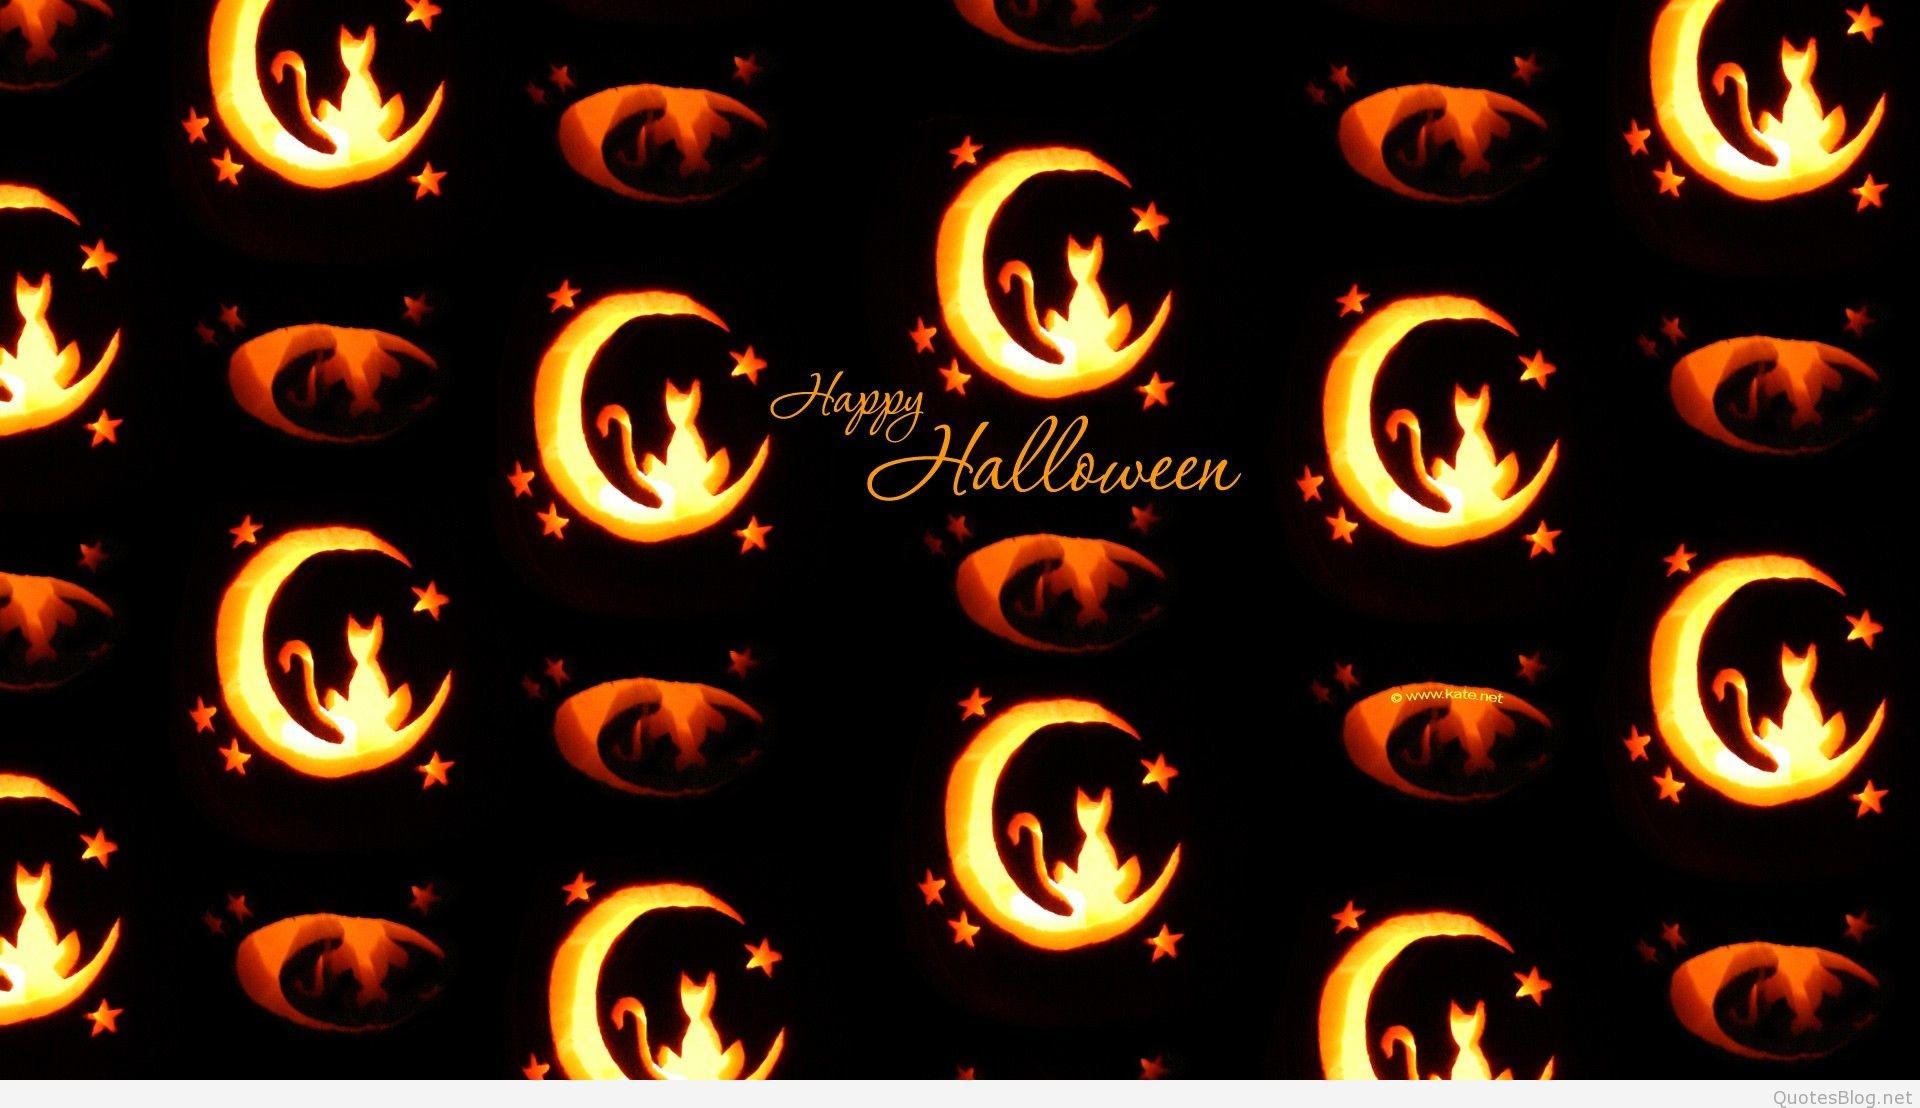 Happy-Halloween-2013-Pics-HD-Wallpaper